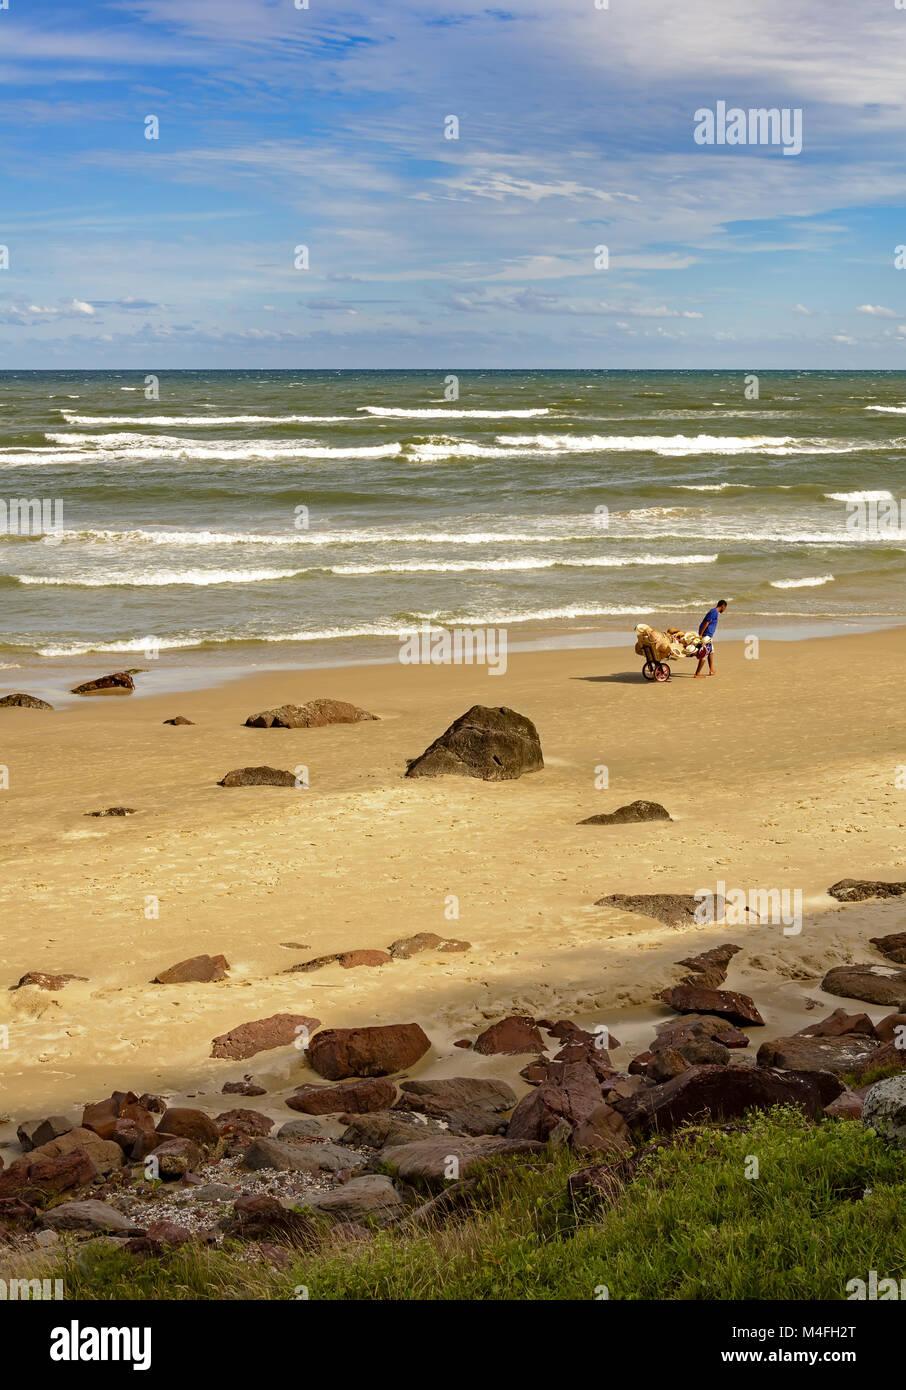 Cal beach in Torres city - Stock Image